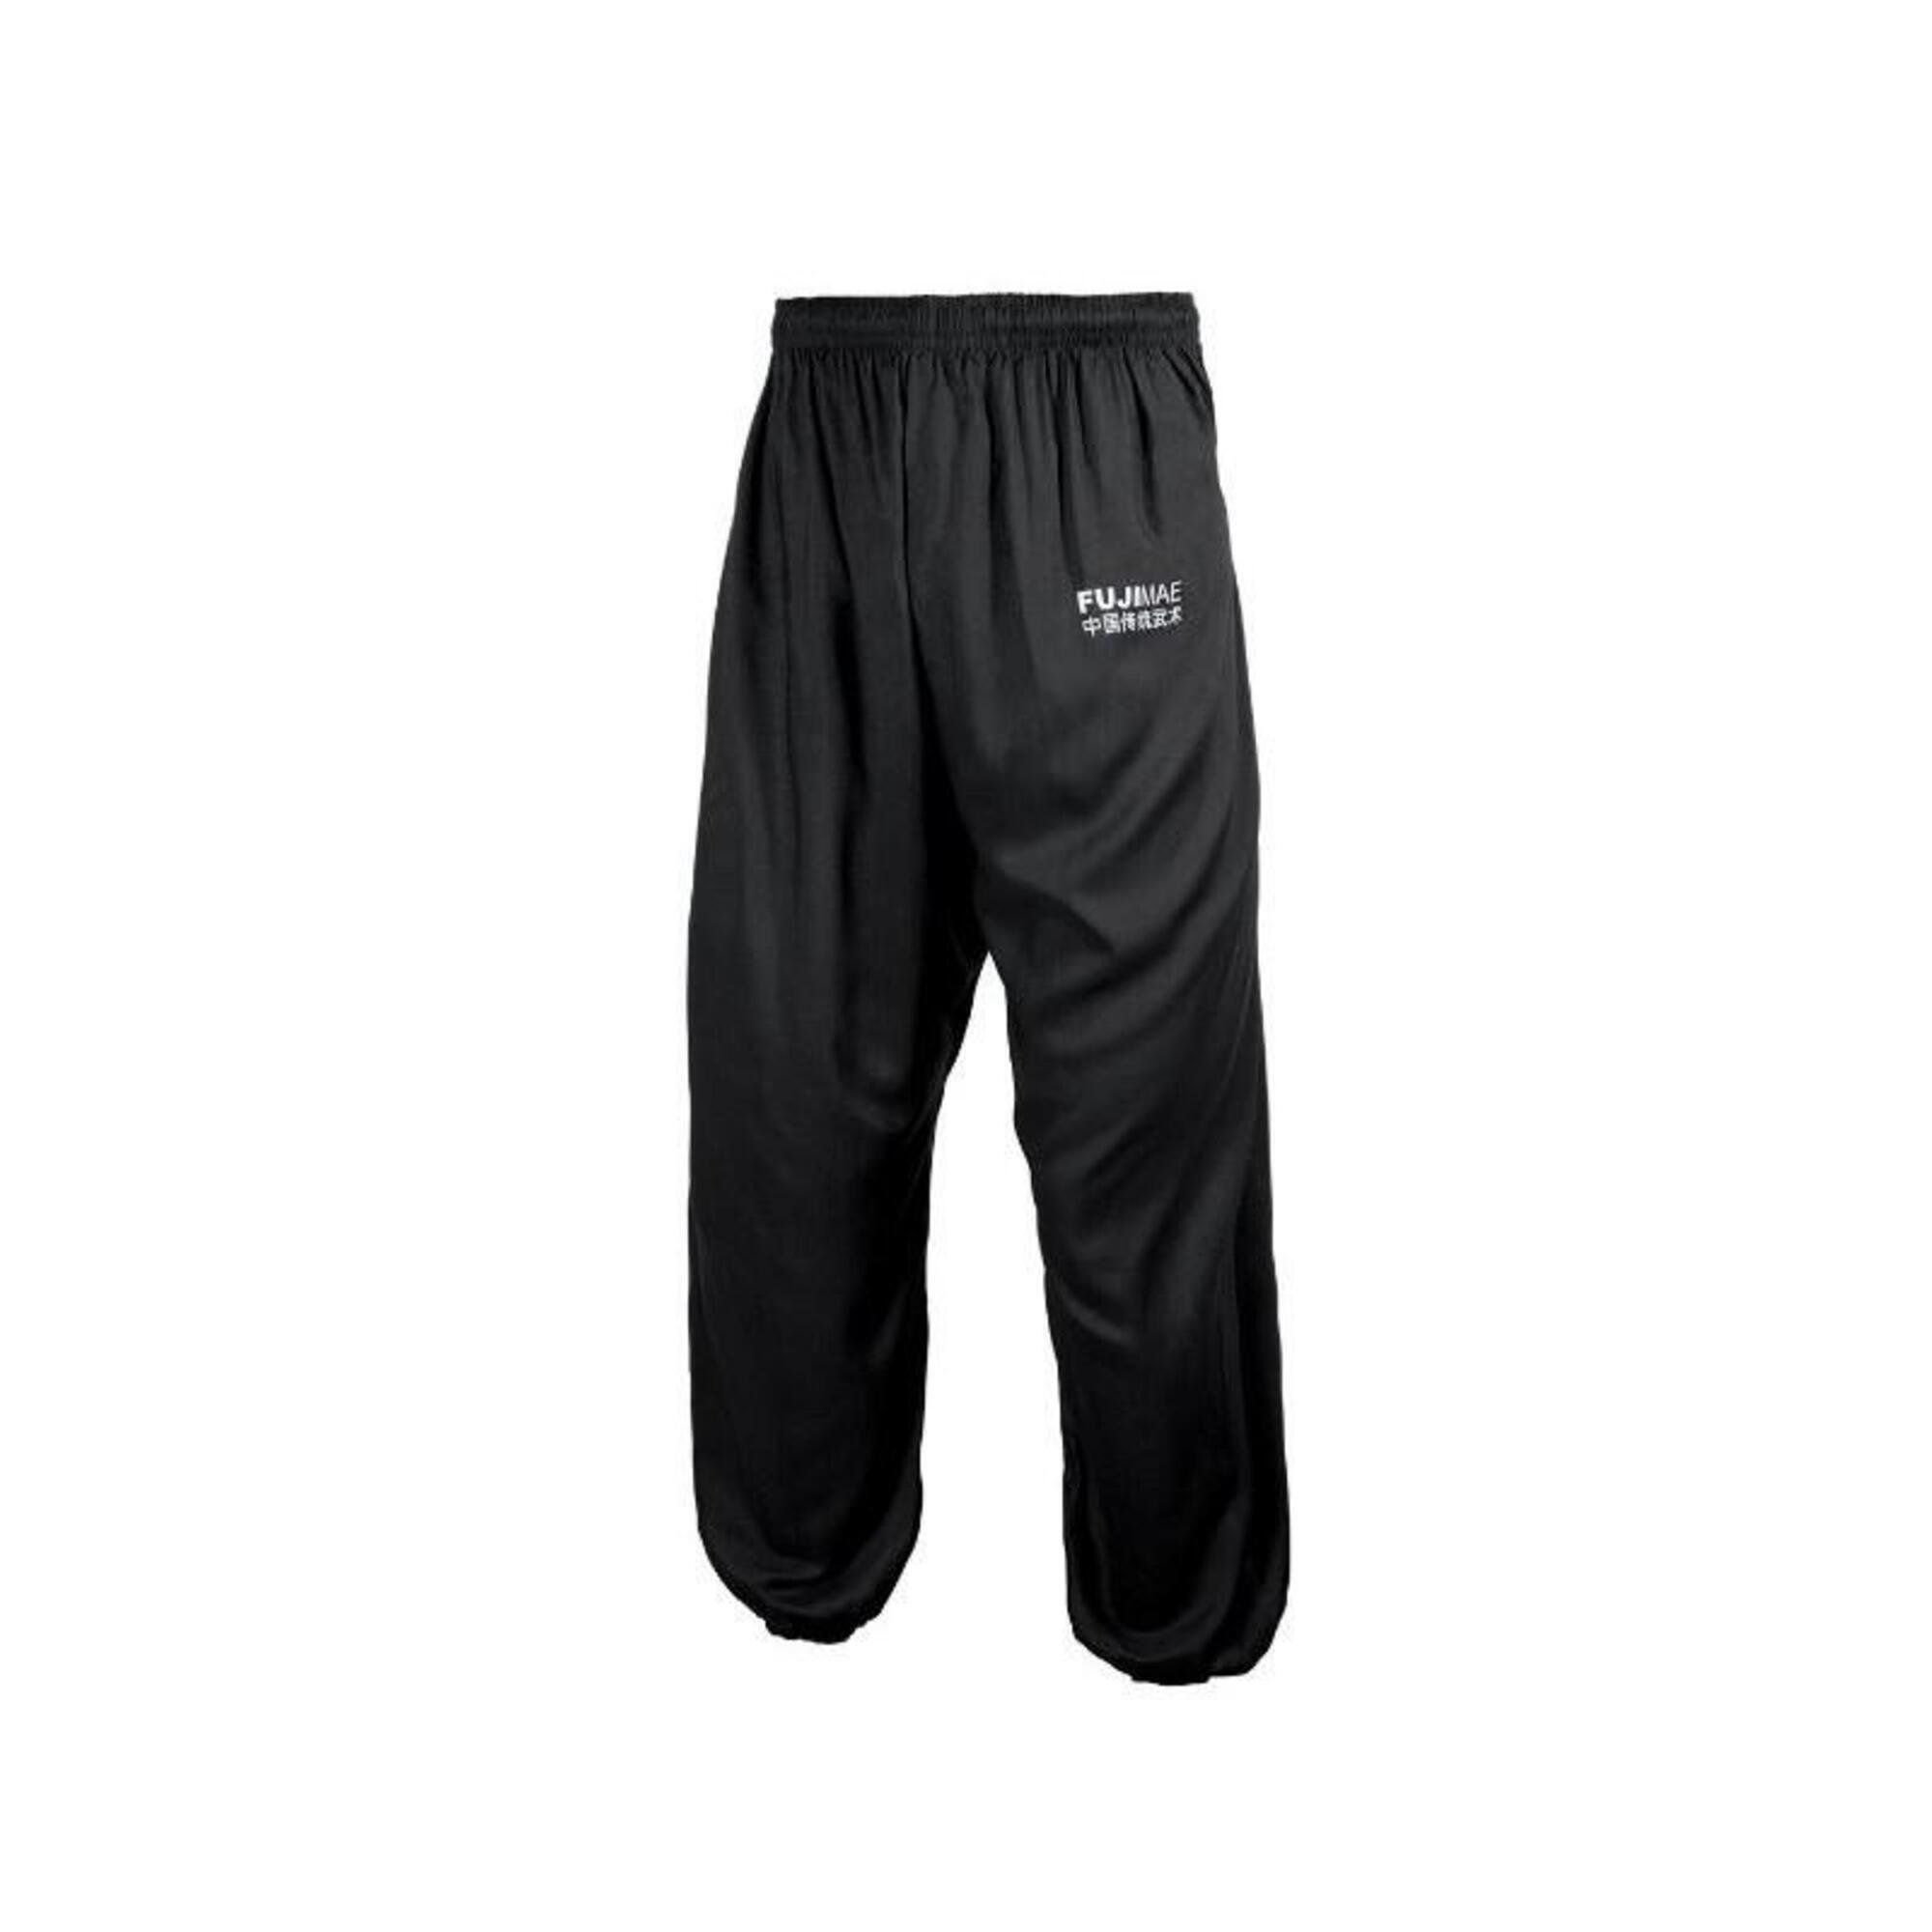 Pantalon de Tai Chi noir bas serré Fuji Mae